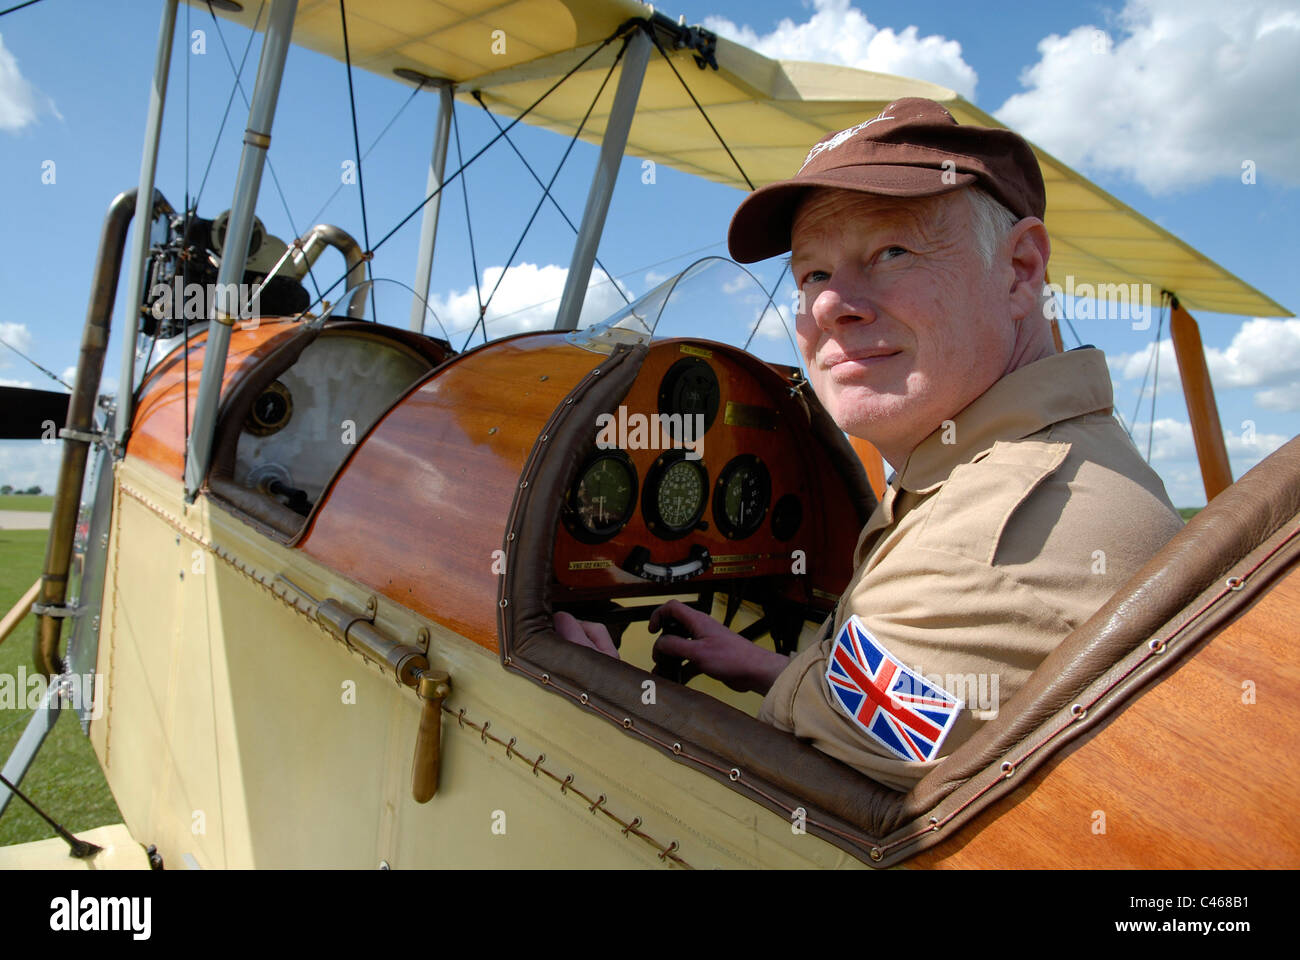 Matthew Boddington in his replica Be-2C WW1 vintage biplane at Sywell Aerodrome, Northamptonshire, 1-06-2011. - Stock Image